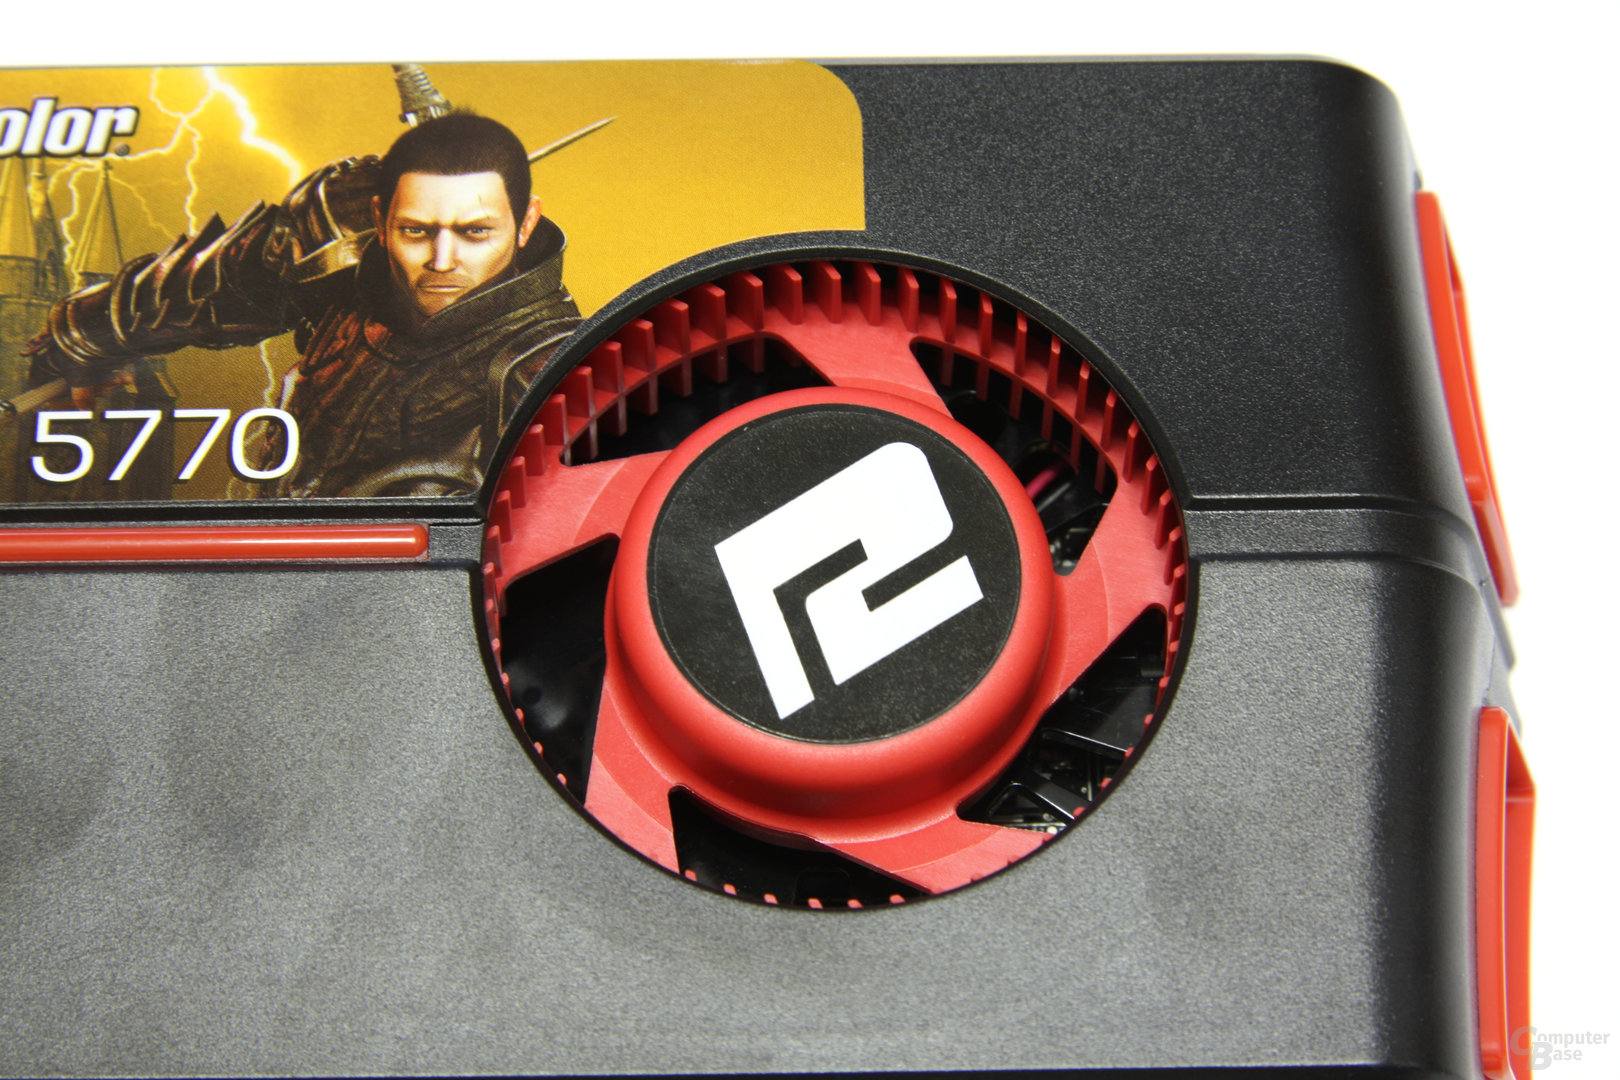 Radeon HD 5770 Lüfter